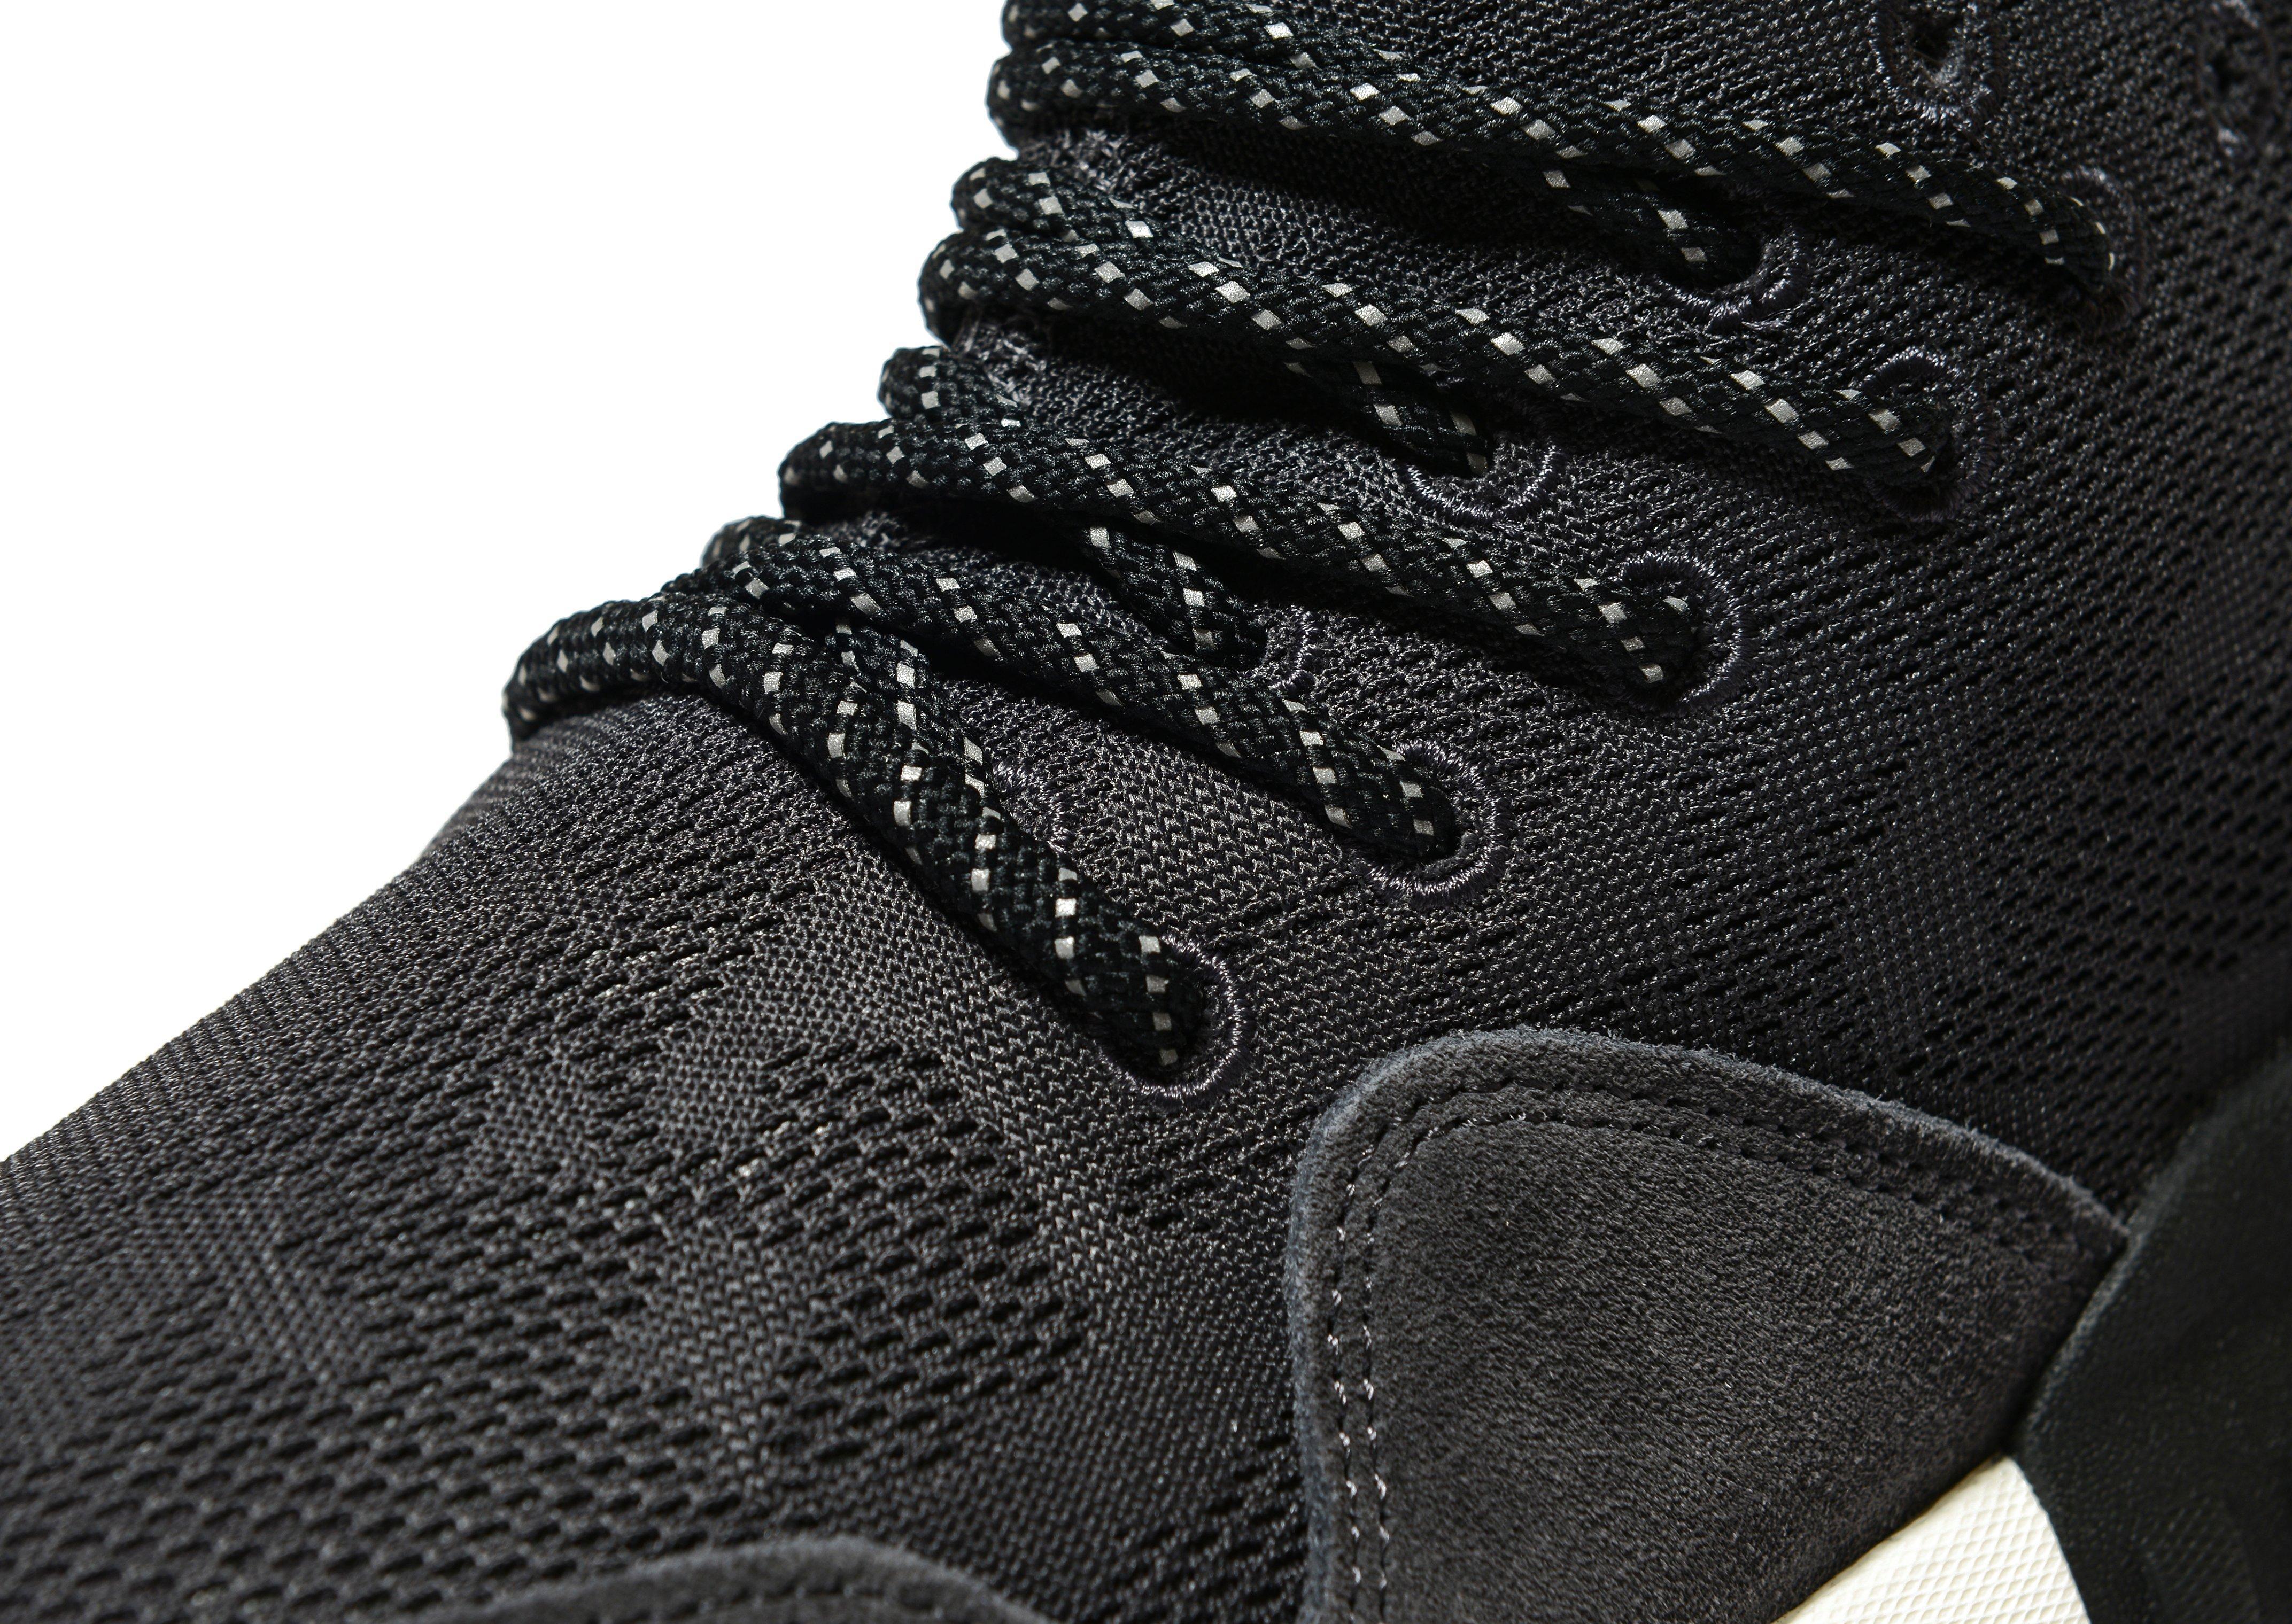 Lyst adidas Originals tubular x uncaged en negro para hombres